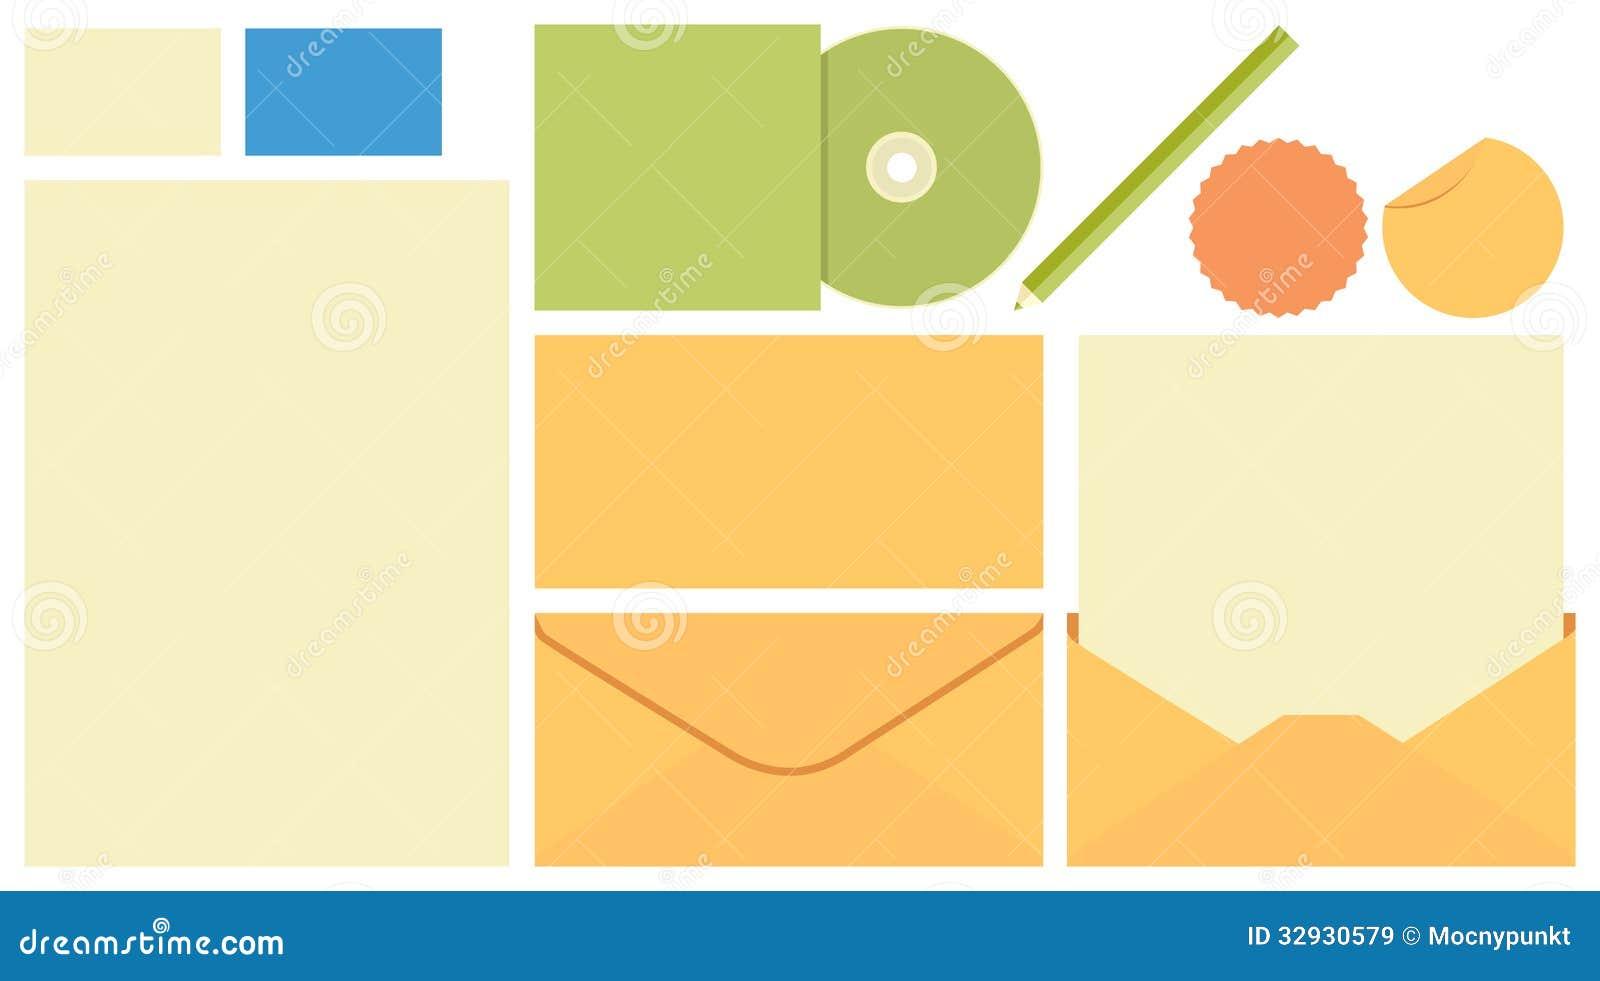 stationary template envelope cd cover pen card stock vector image 32930579. Black Bedroom Furniture Sets. Home Design Ideas